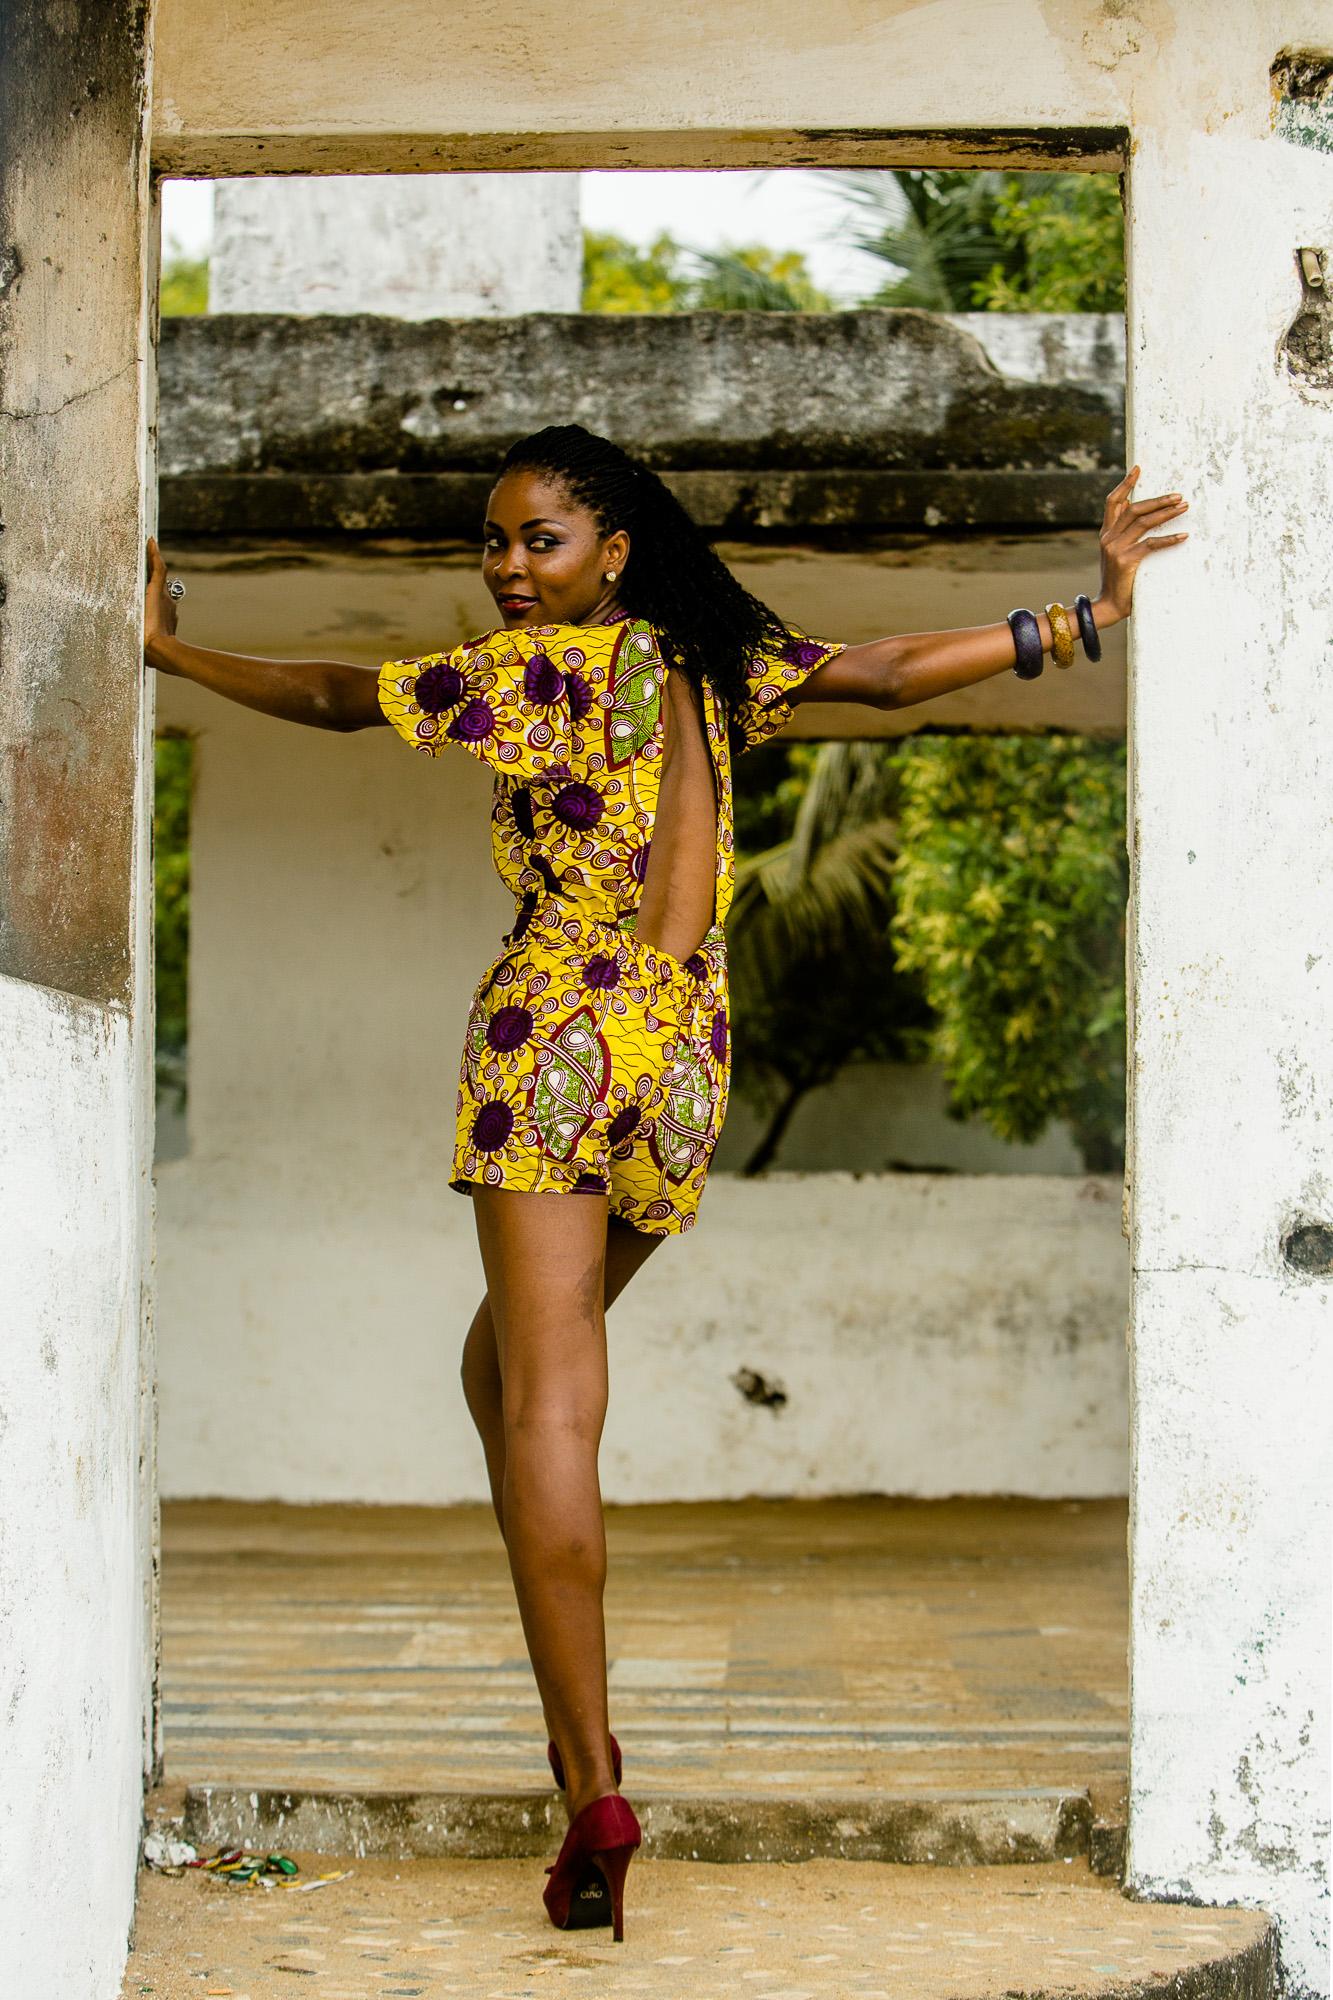 140112-Liberia-Wingard-2688-web.jpg